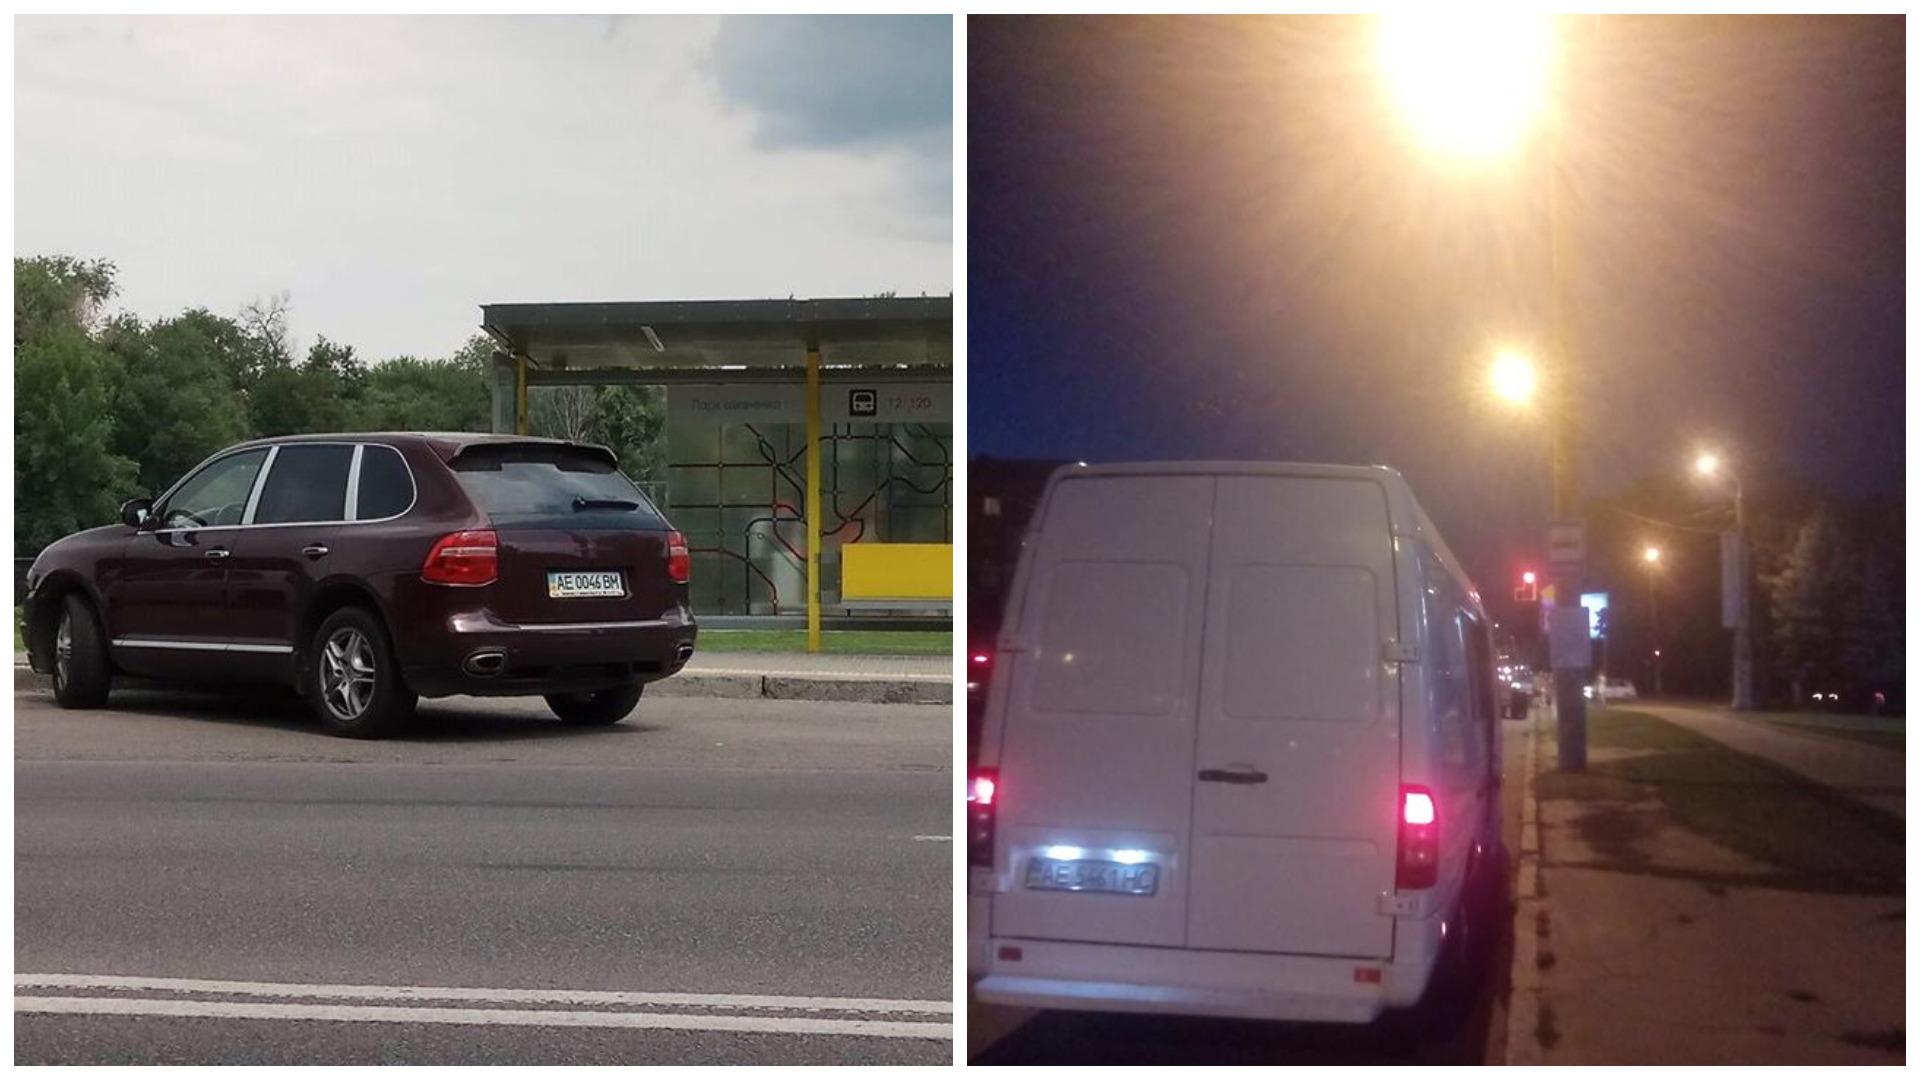 Mercedes-Benz Sprinter с номером АЕ 5461 НС и с Porsche Cayenne номером АЕ 0046 ВМ